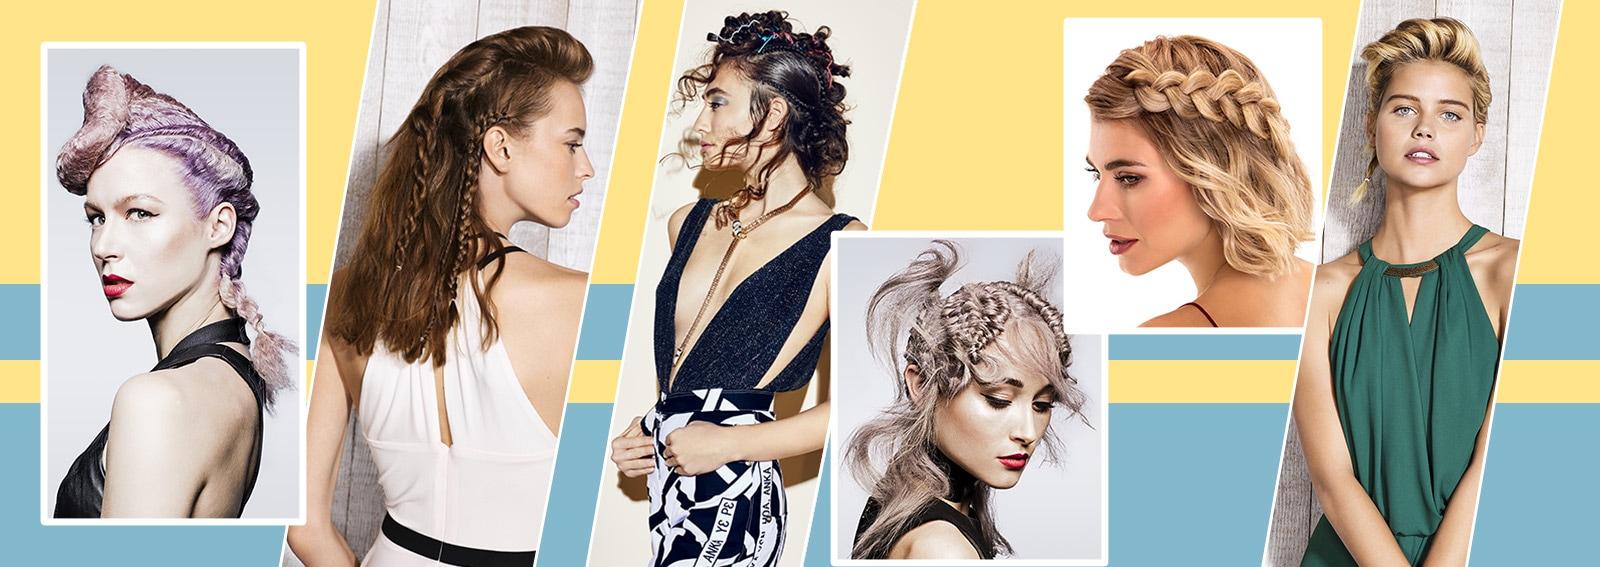 acconciature capelli saloni primavera estate 2017 collage_desktop